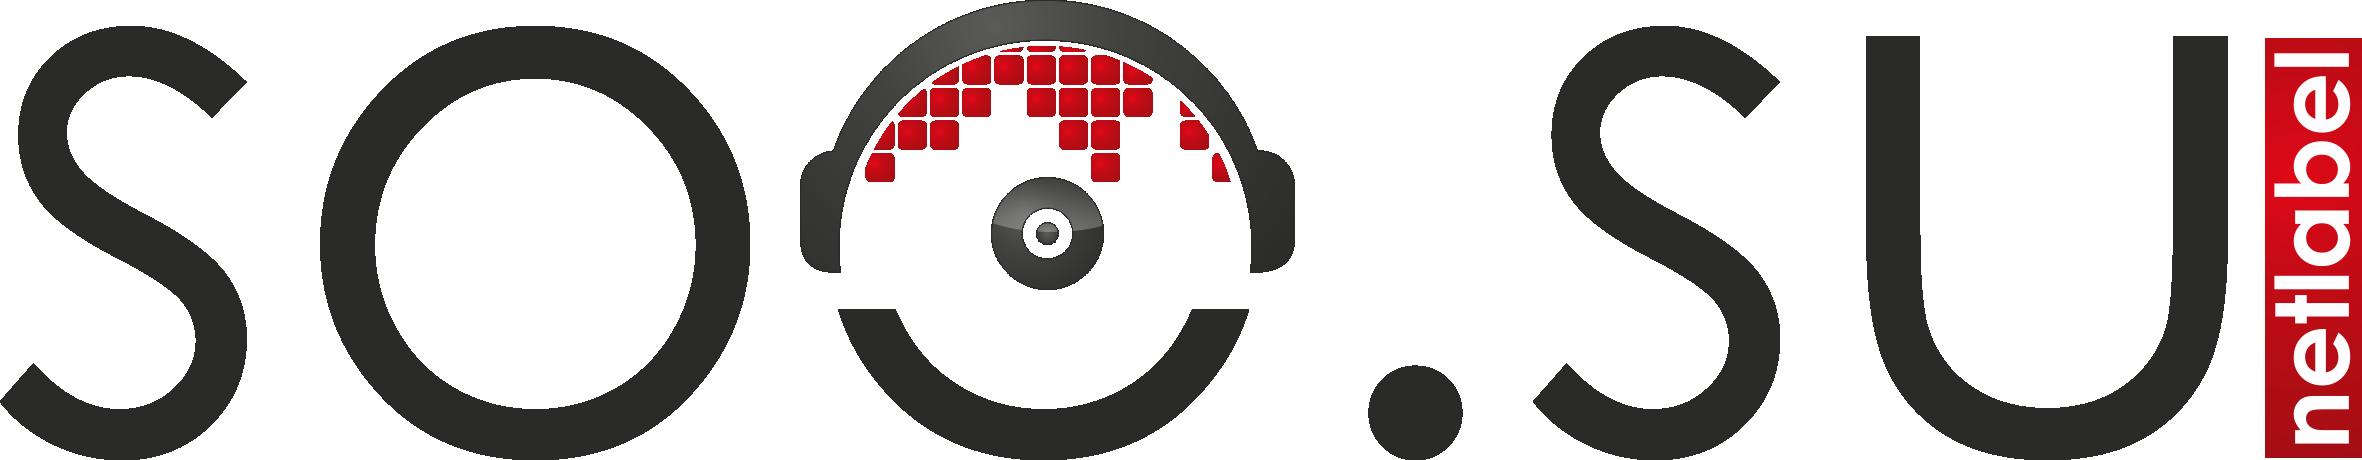 soo.su logo